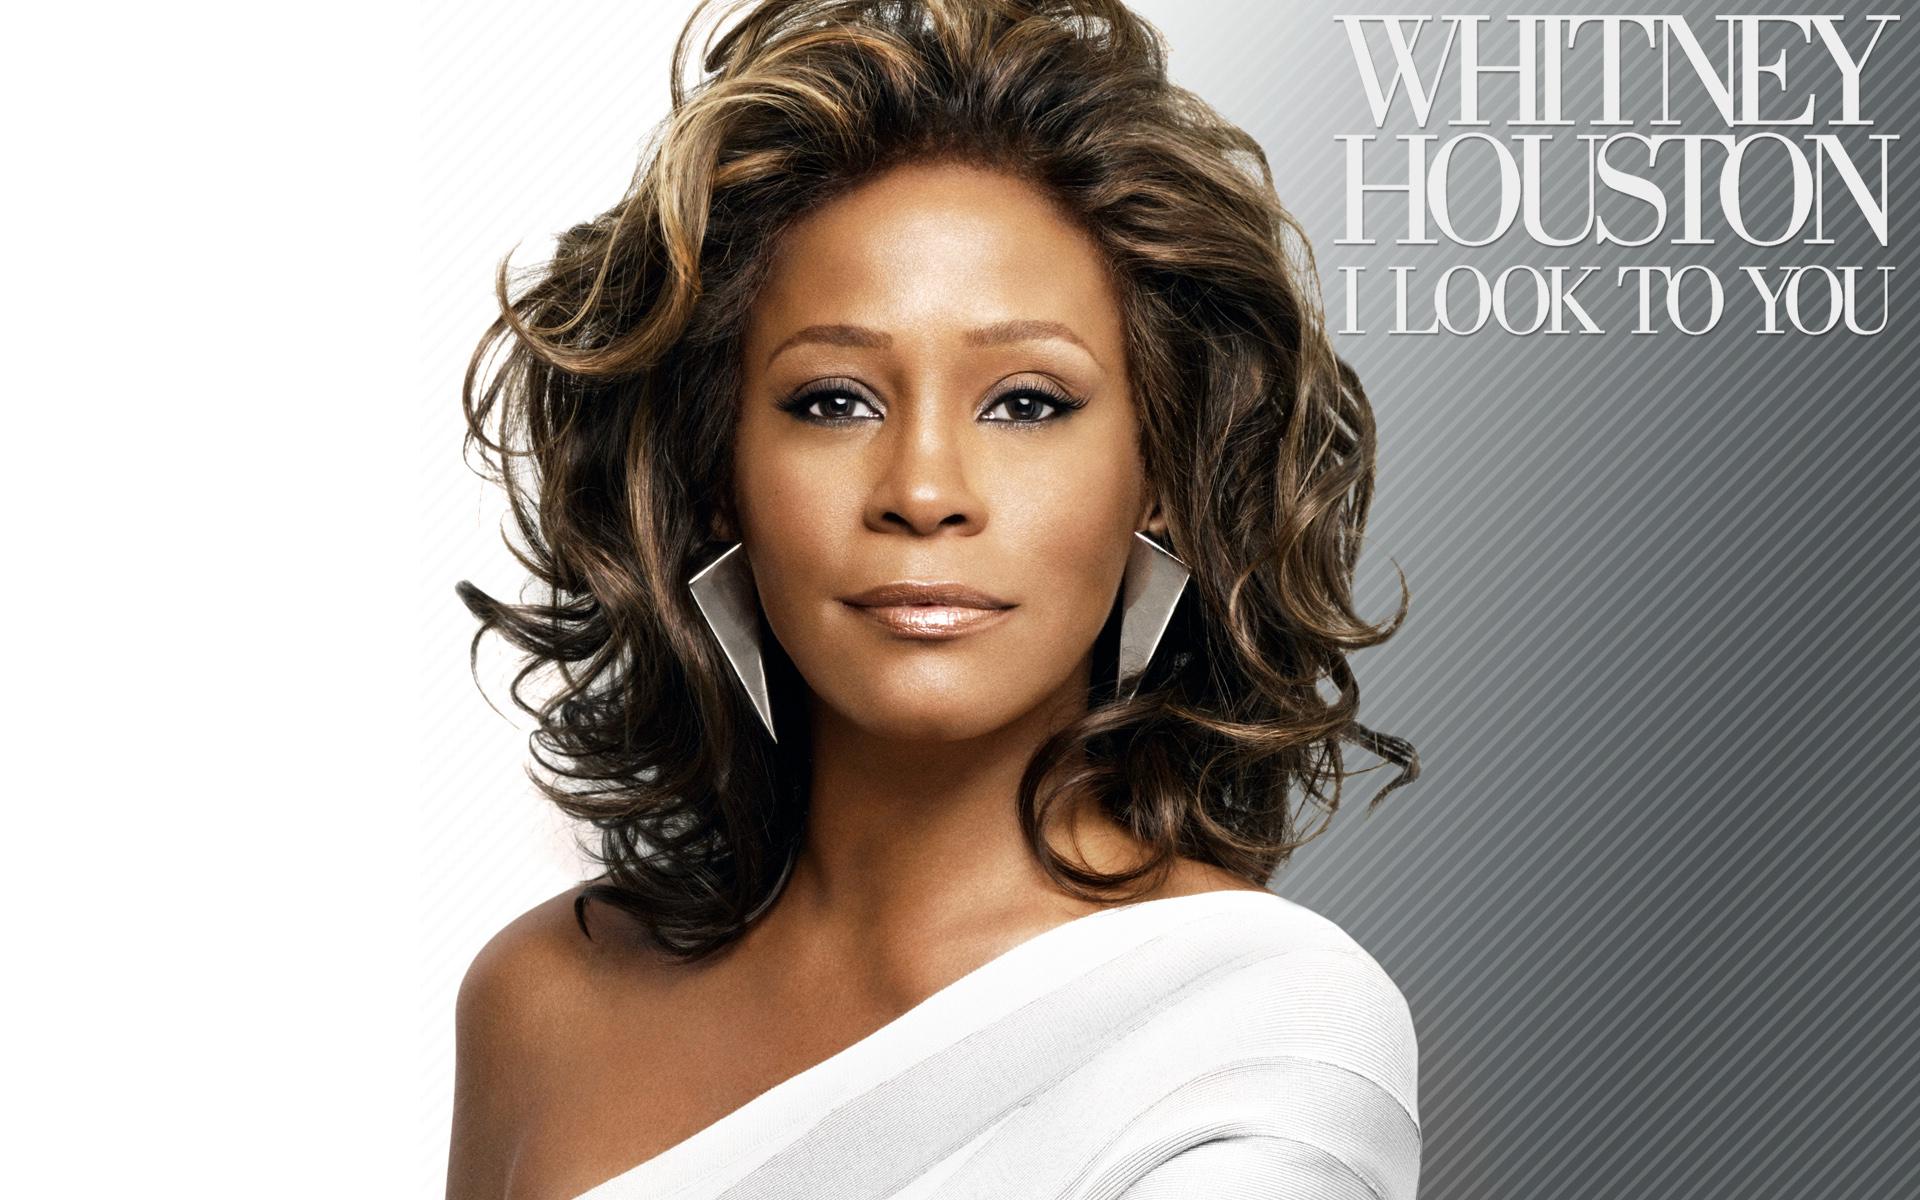 Whitney houston to release 39 greatest performances 39 album for The whitney